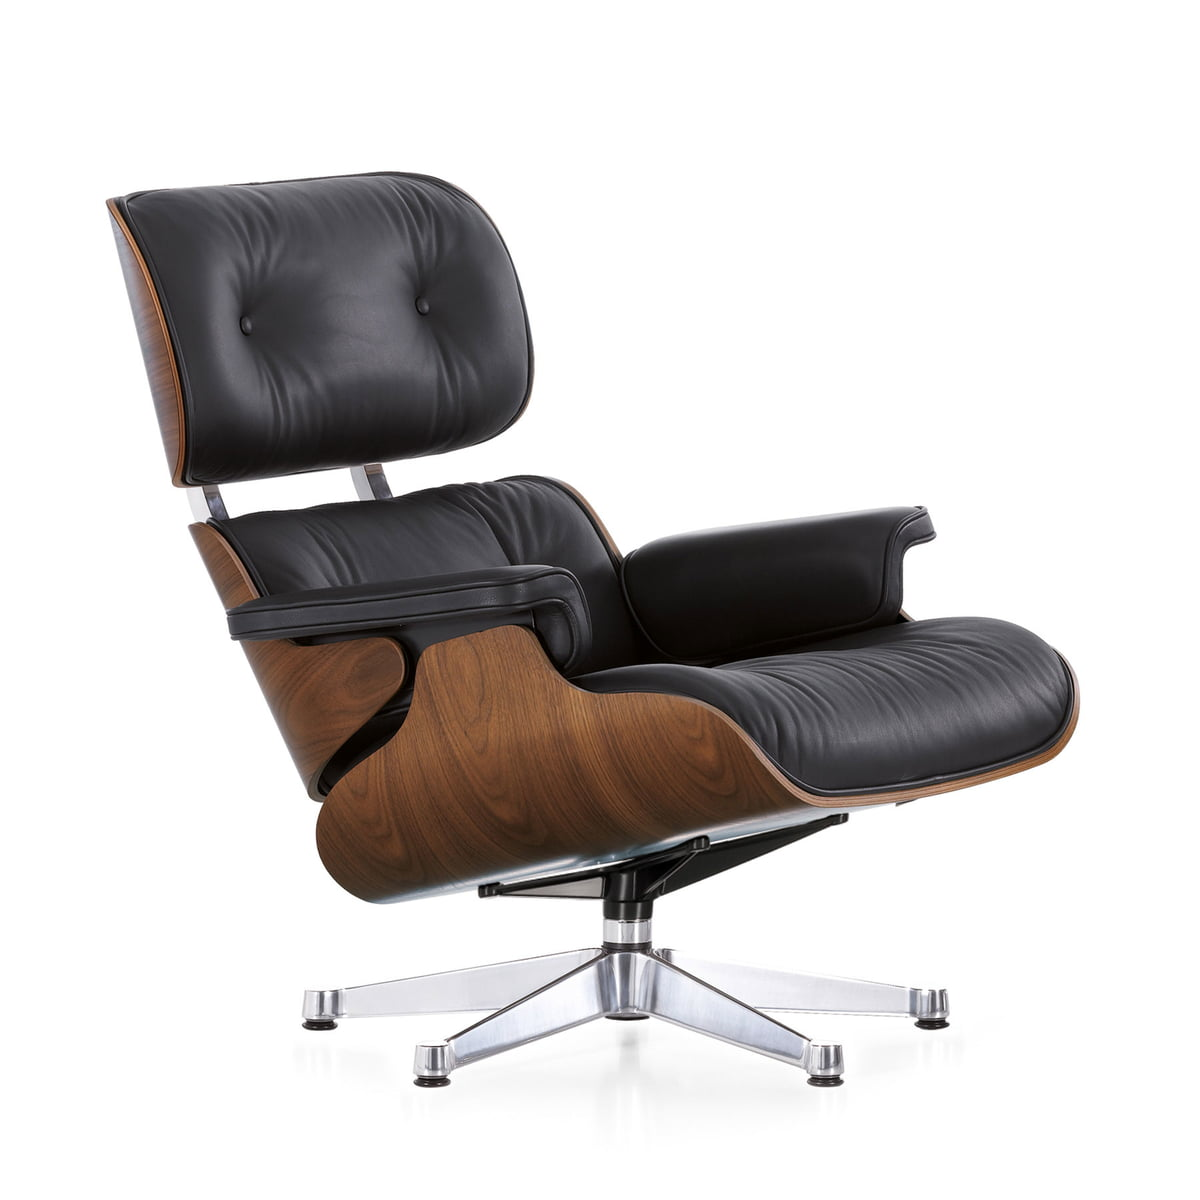 Vitra lounge chair amp ottoman white version von charles amp ray eames - Vitra Lounge Chair In Walnut